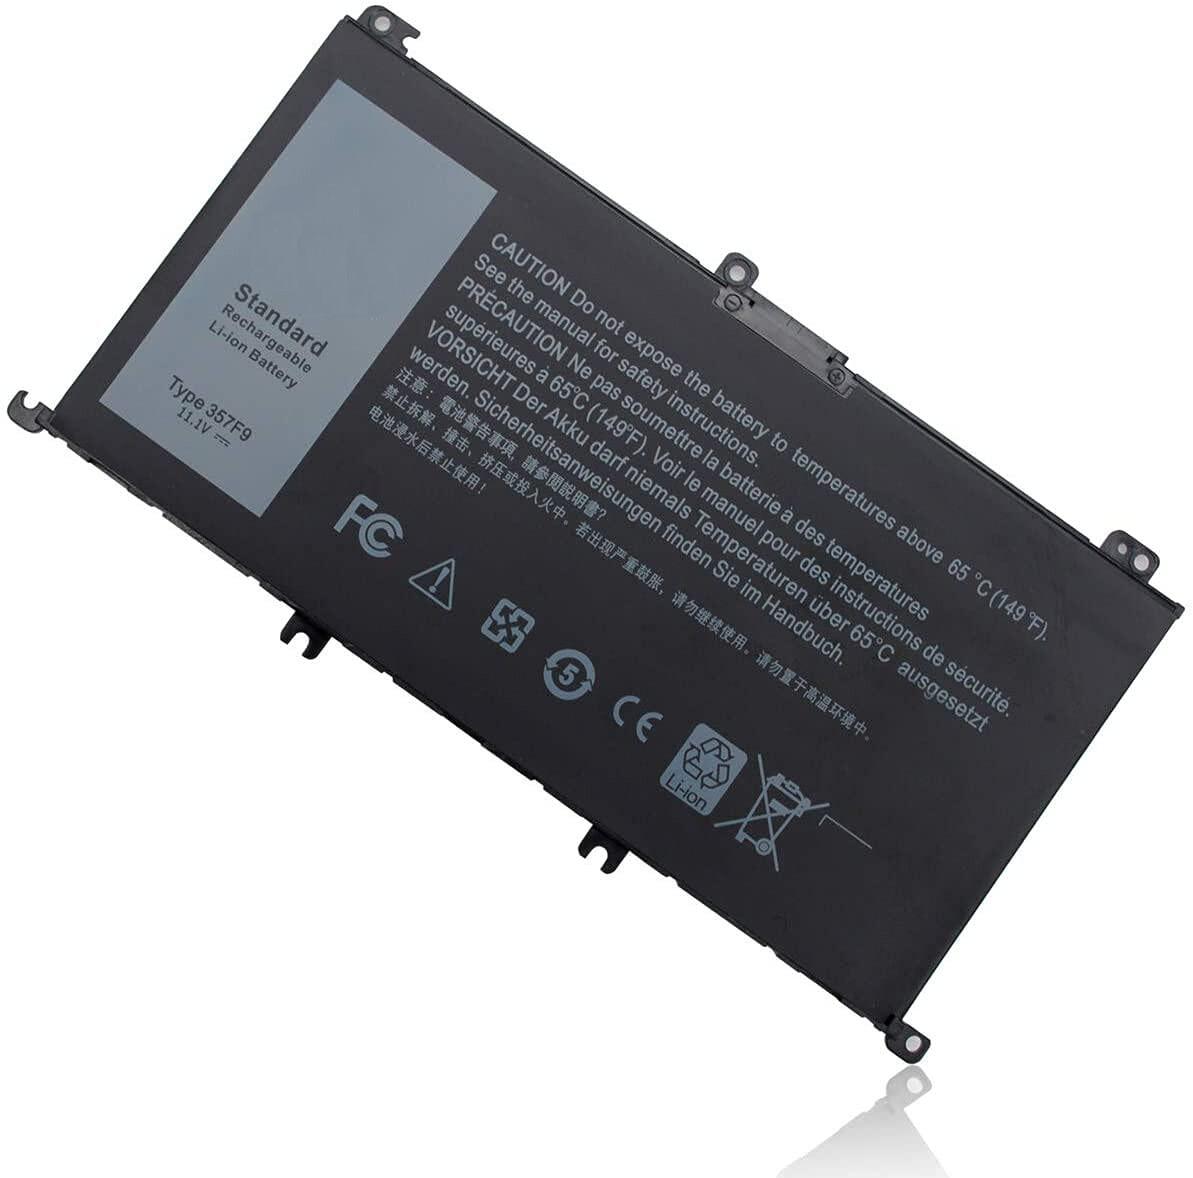 357F9 71JF4 Dell Inspiron 15 7000 7559 7557 7567 7566 7759 15 5576 5577 INS15PD 15-7559 0GFJ6 P57F 071JF4 0357F9 Laptop Battery